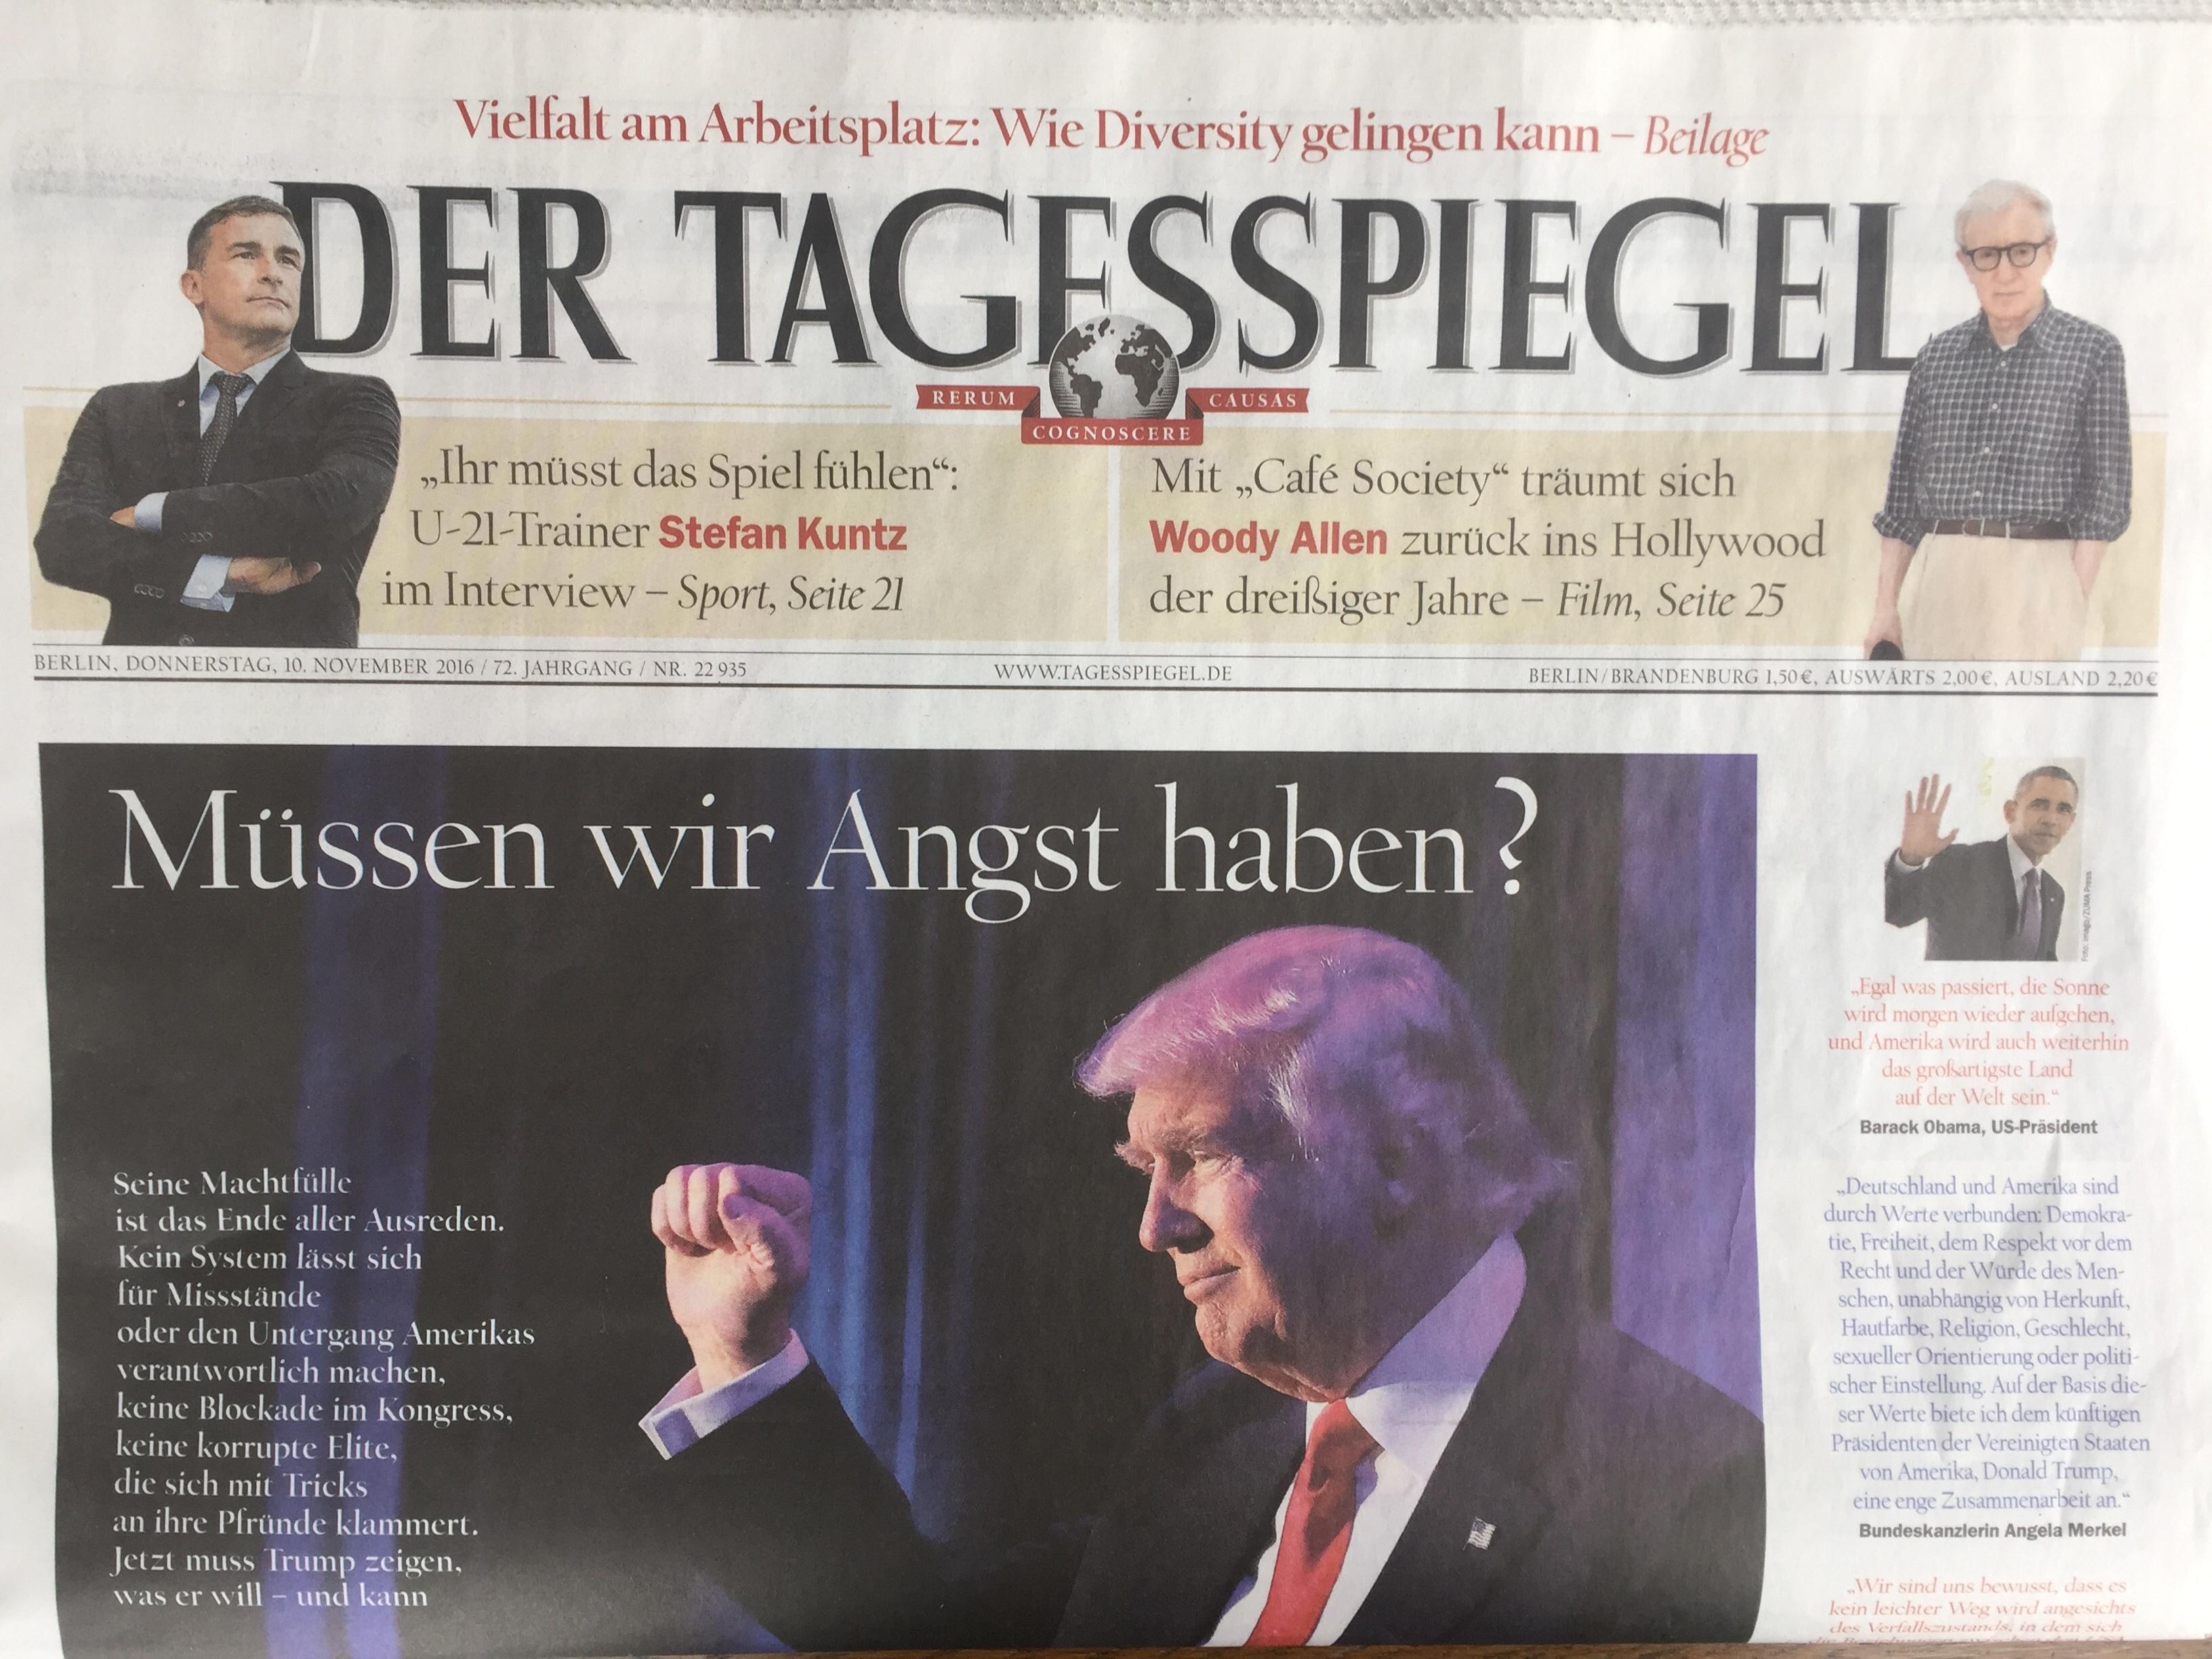 The front page of German newspaper, Der Tagesspiegel, Nov. 10 2016.